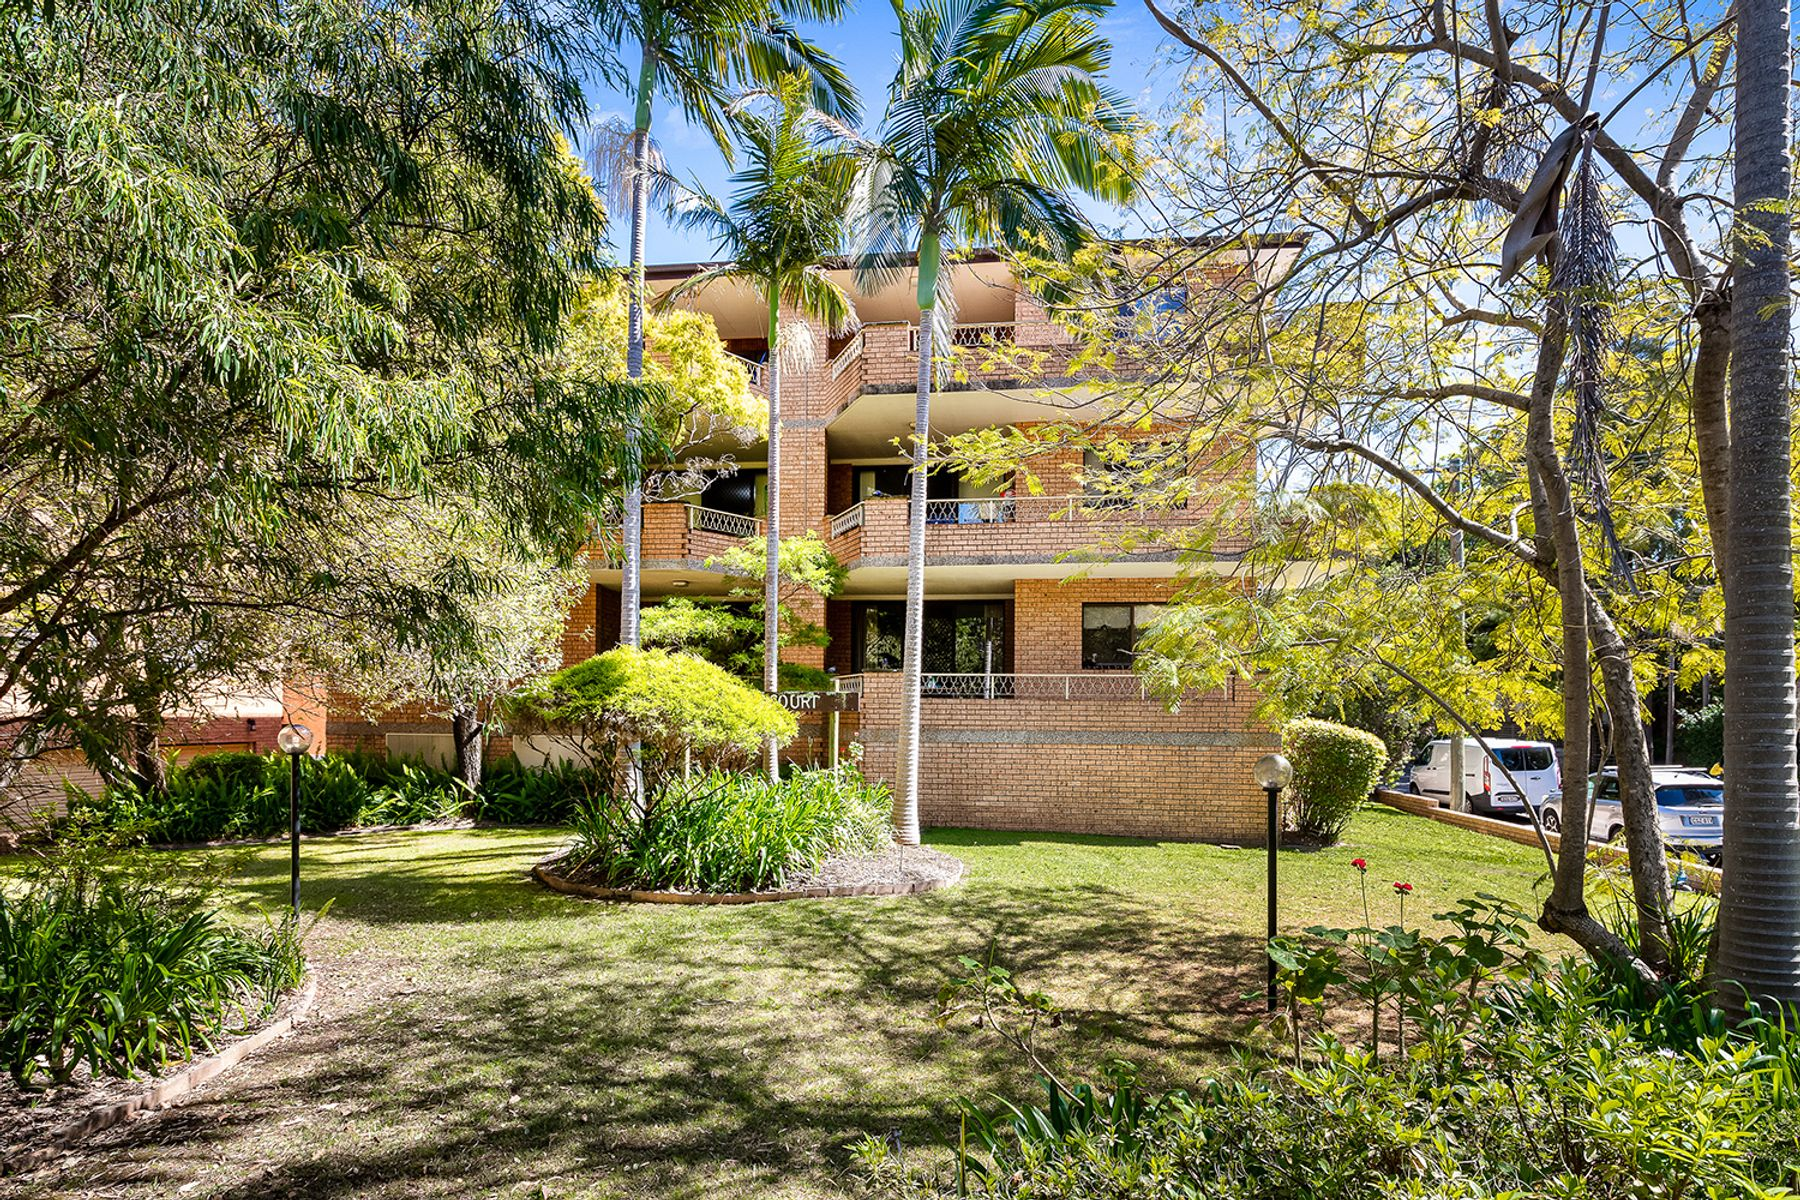 18/49-53 Albert Road, Strathfield, NSW 2135